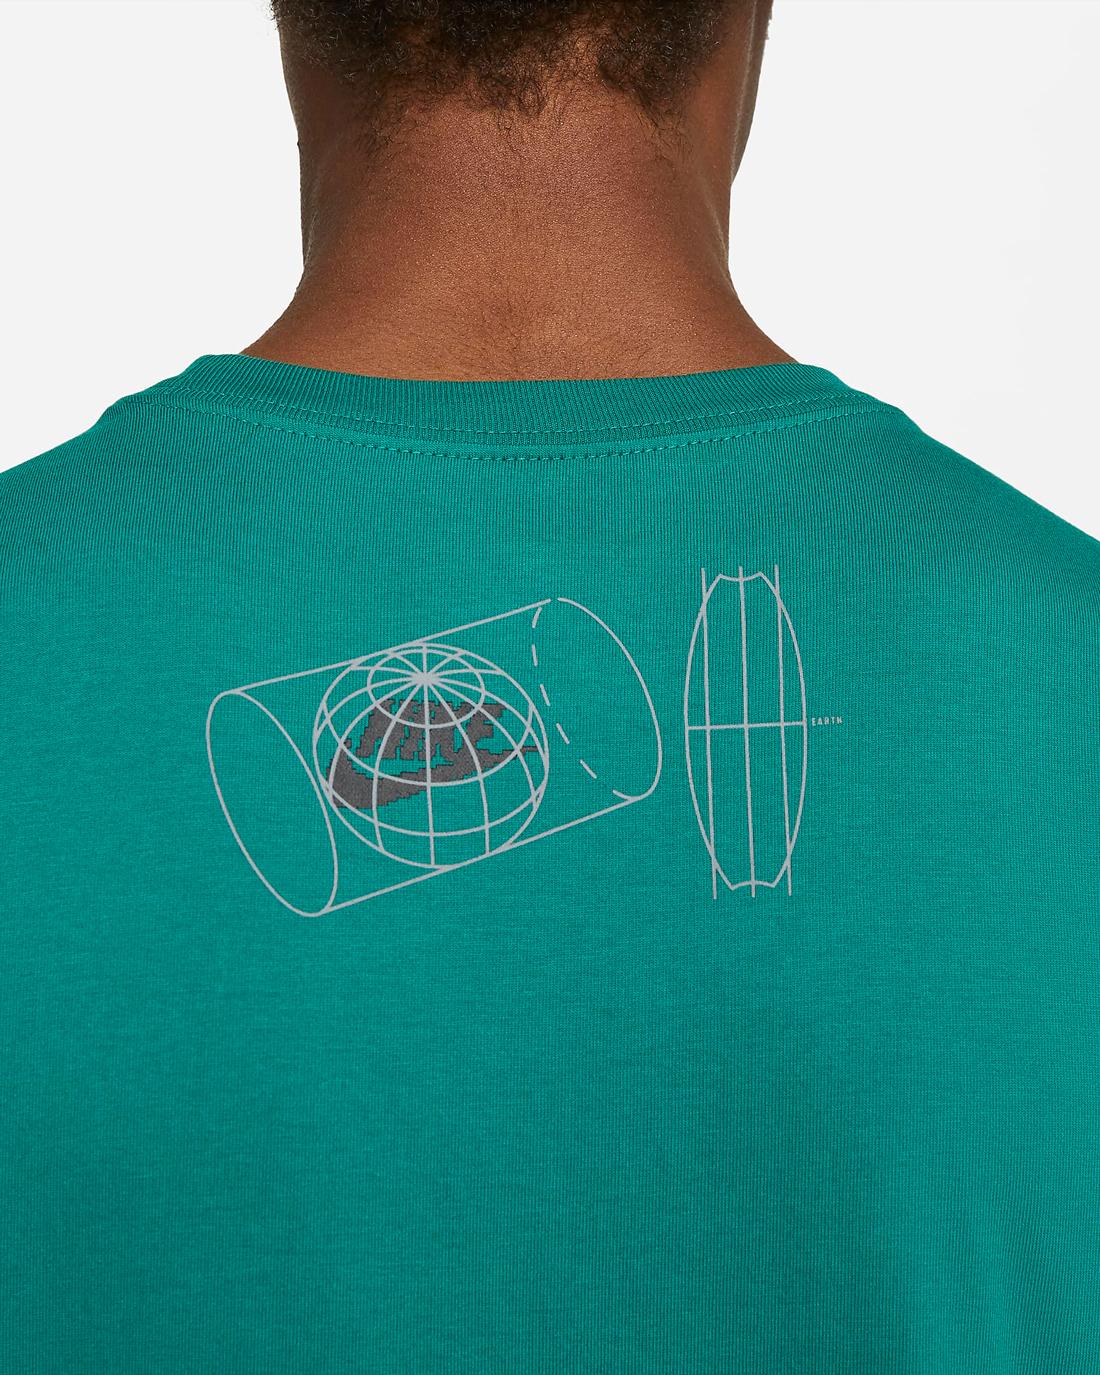 nike-air-vapormax-plus-atlanta-city-special-shirt-3